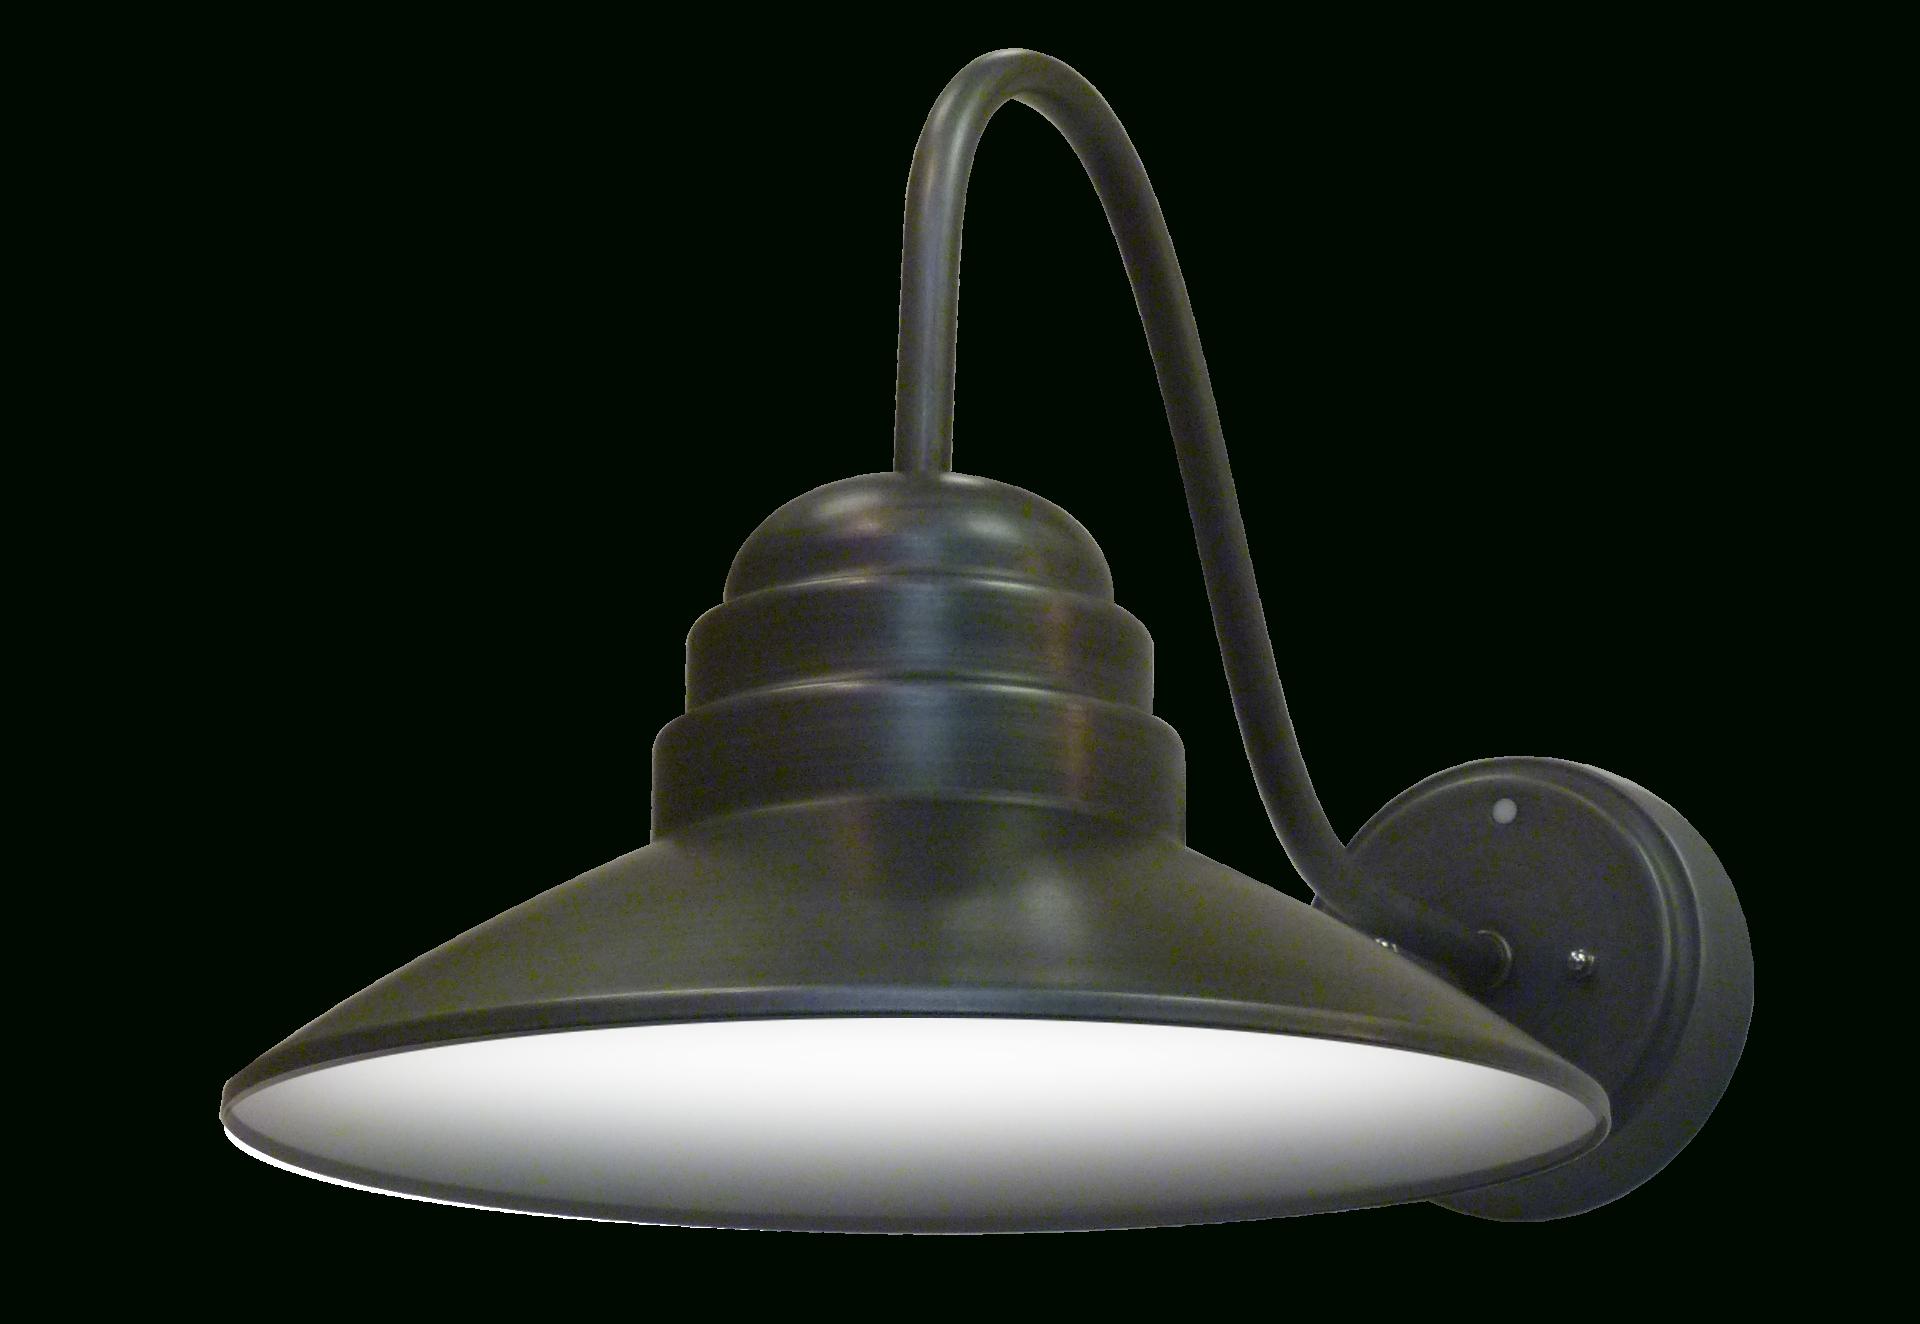 Popular Led Outdoor Gooseneck Lantern (View 20 of 20)